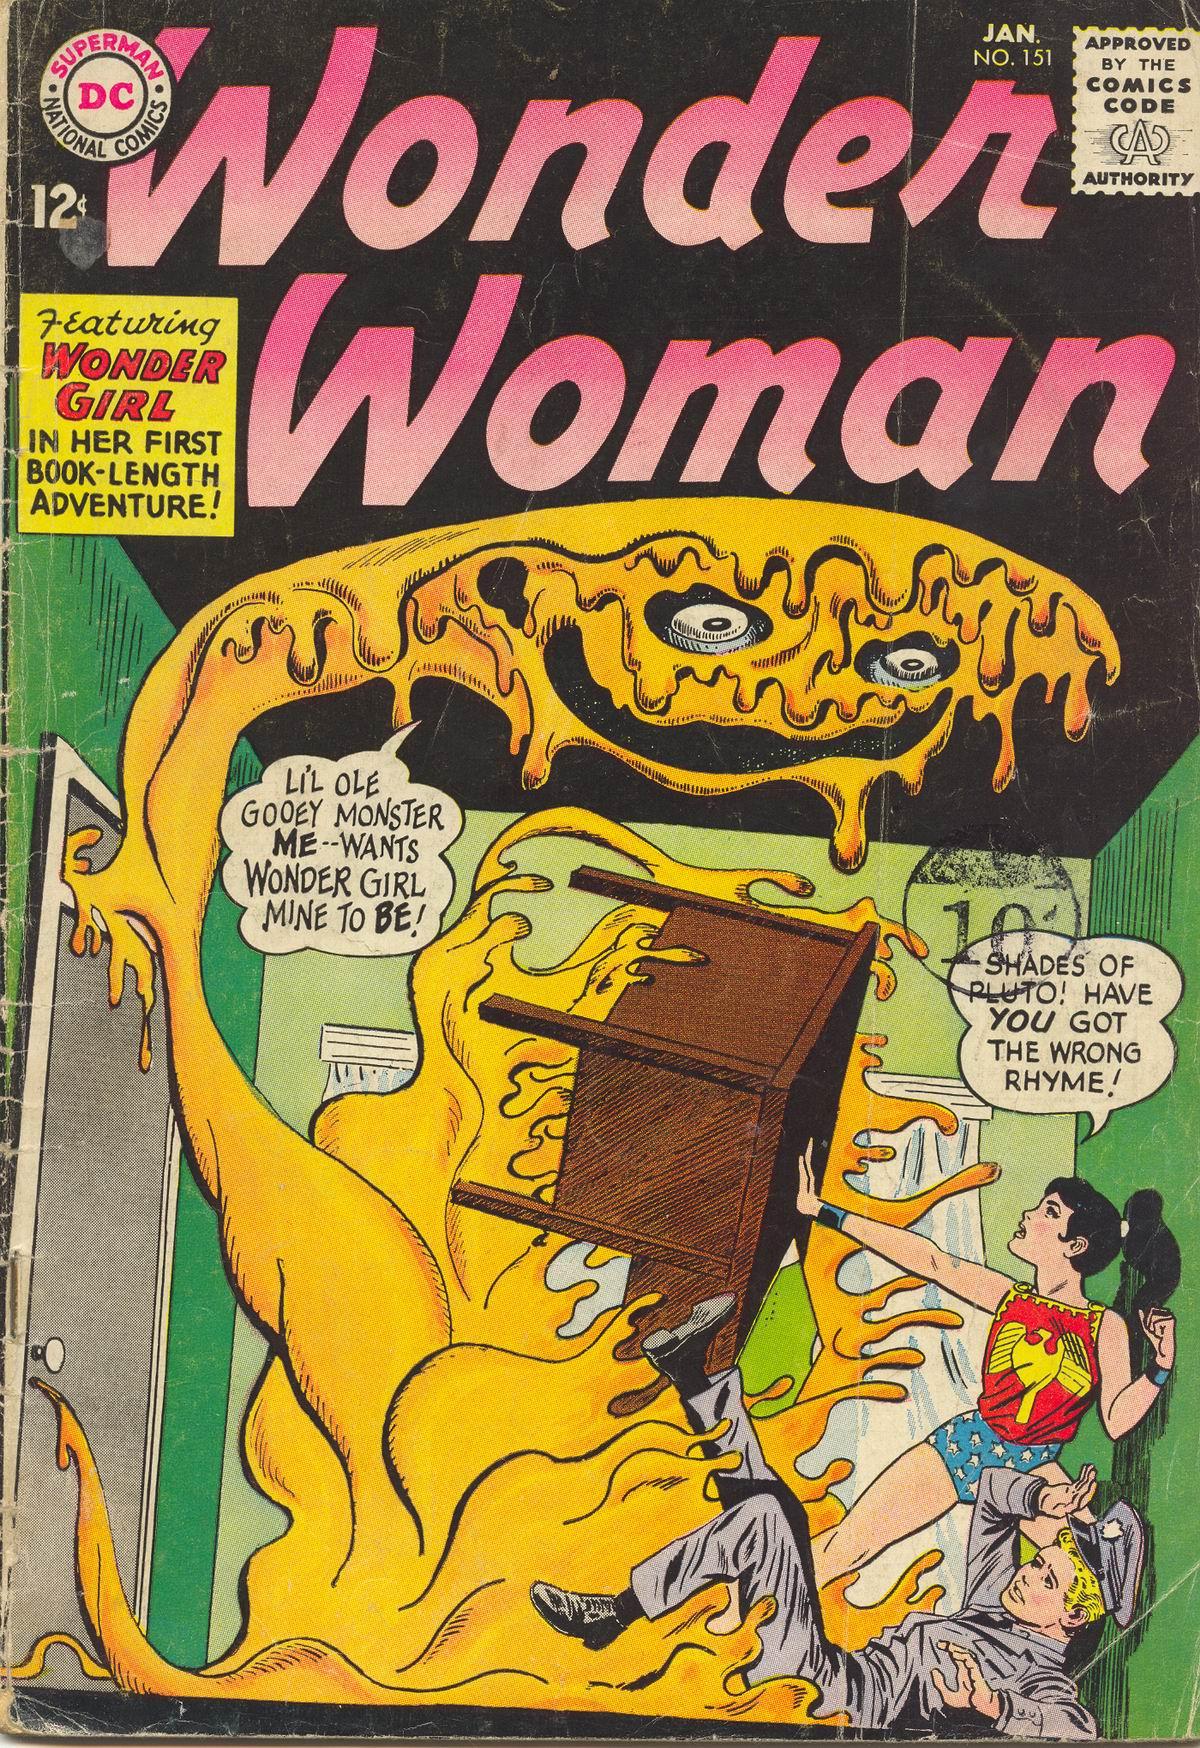 Read online Wonder Woman (1942) comic -  Issue #151 - 1